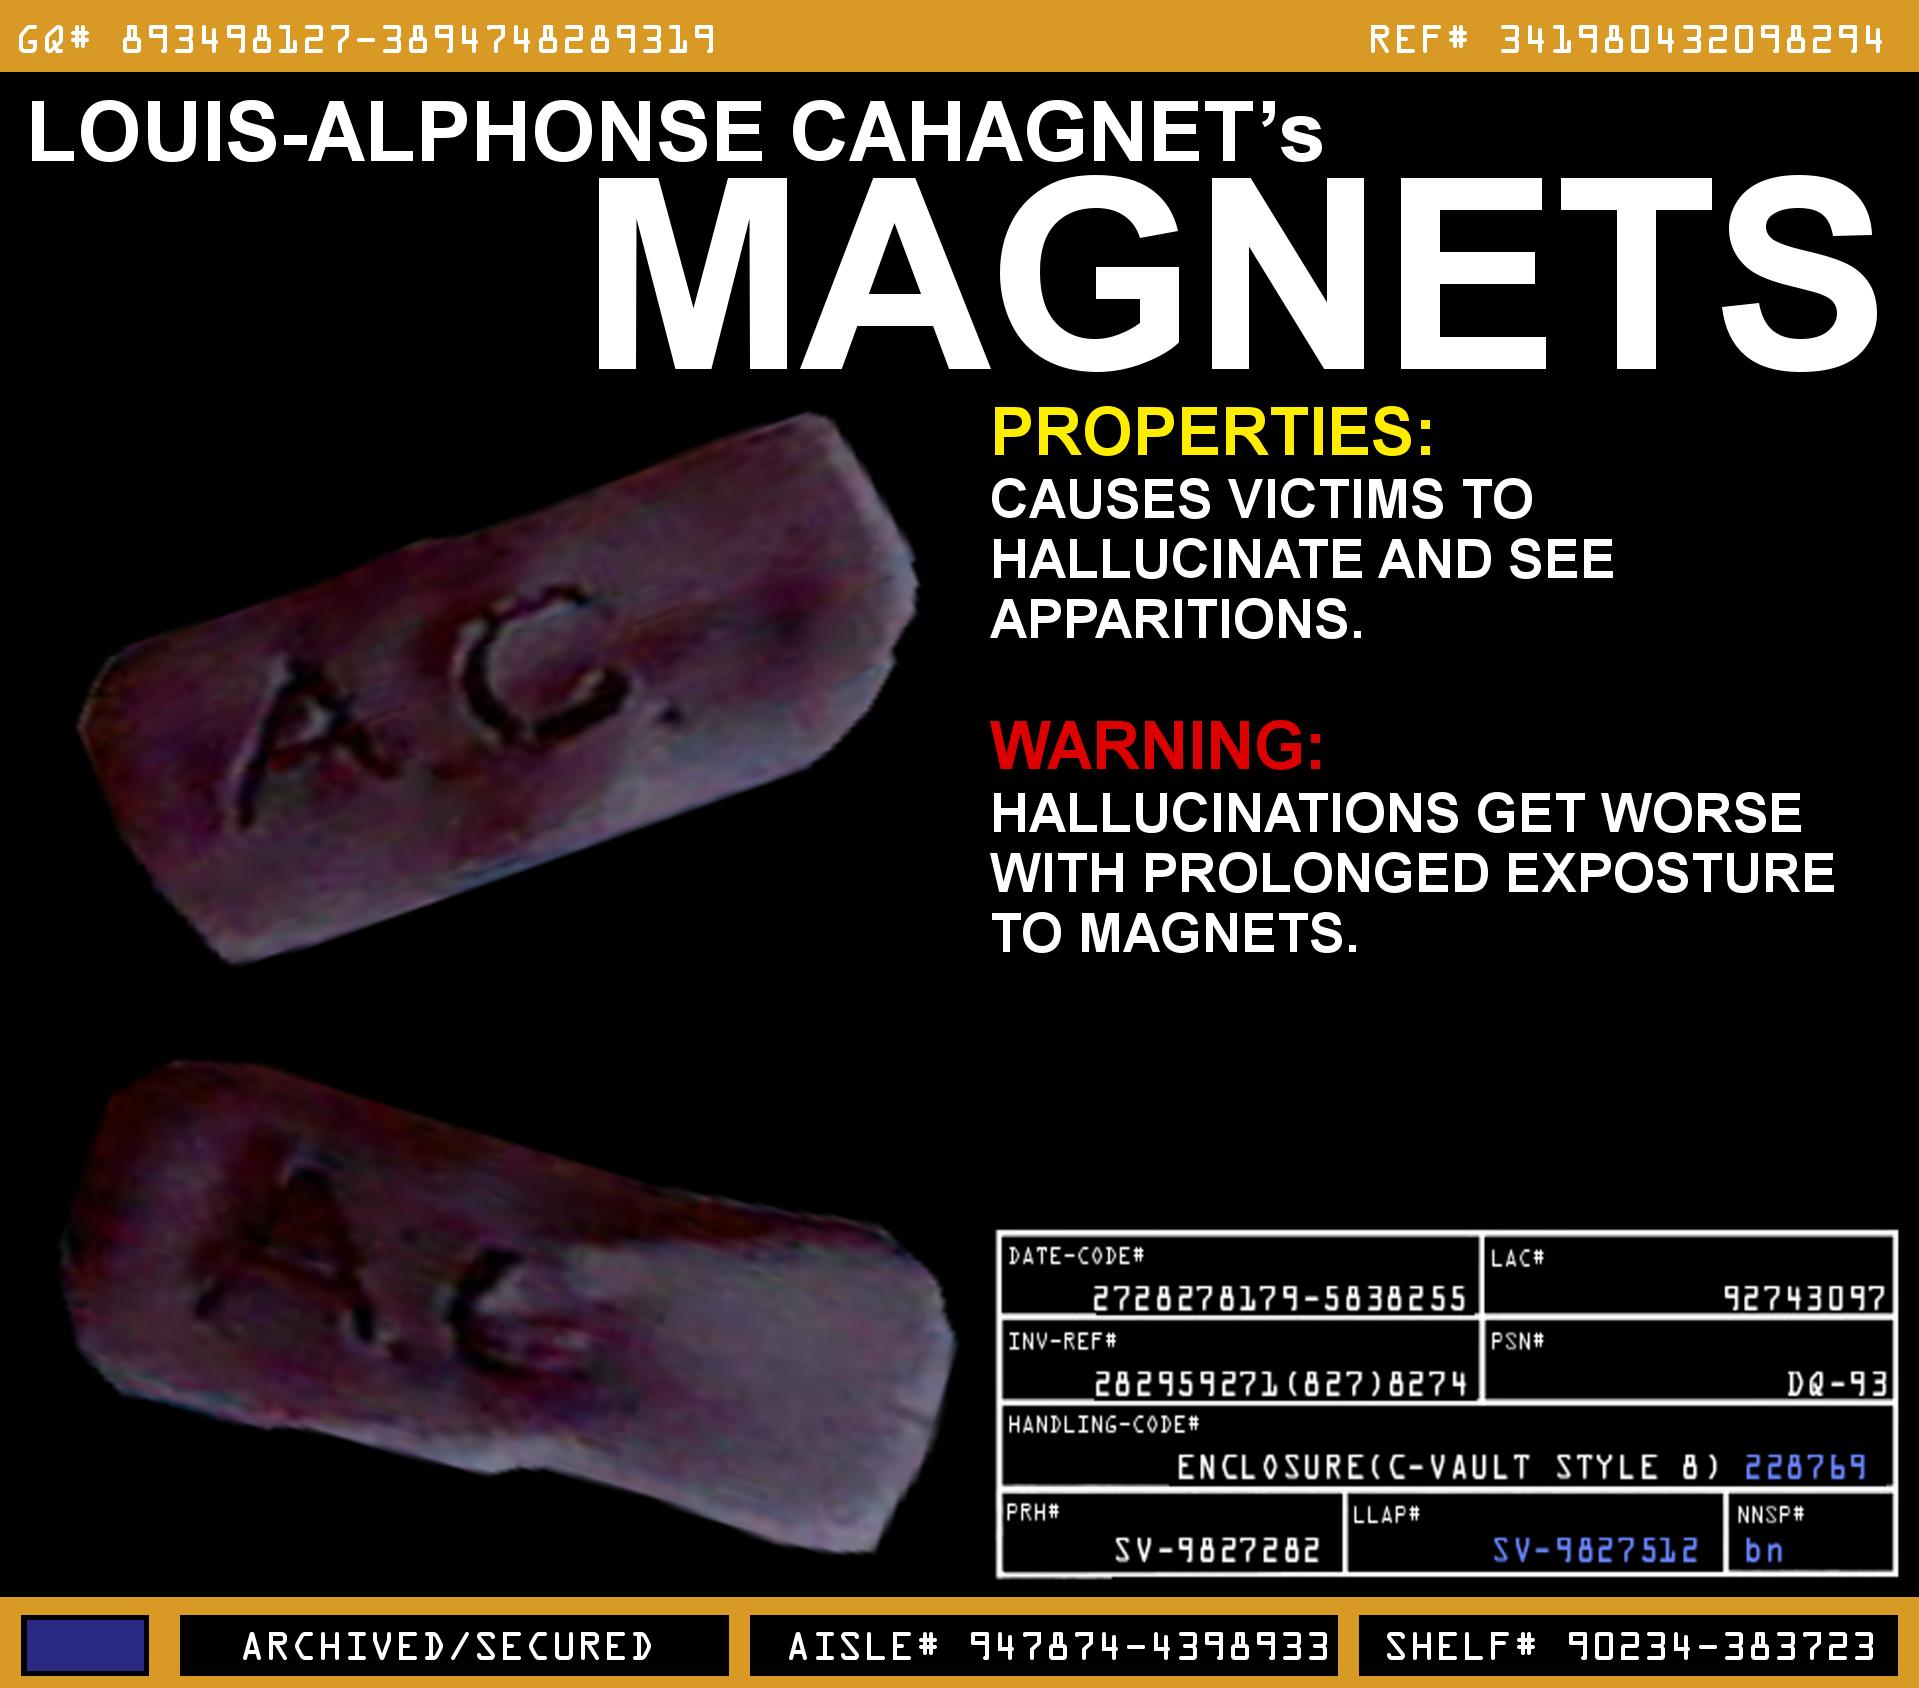 Alphonse Cahagnet's Magnets